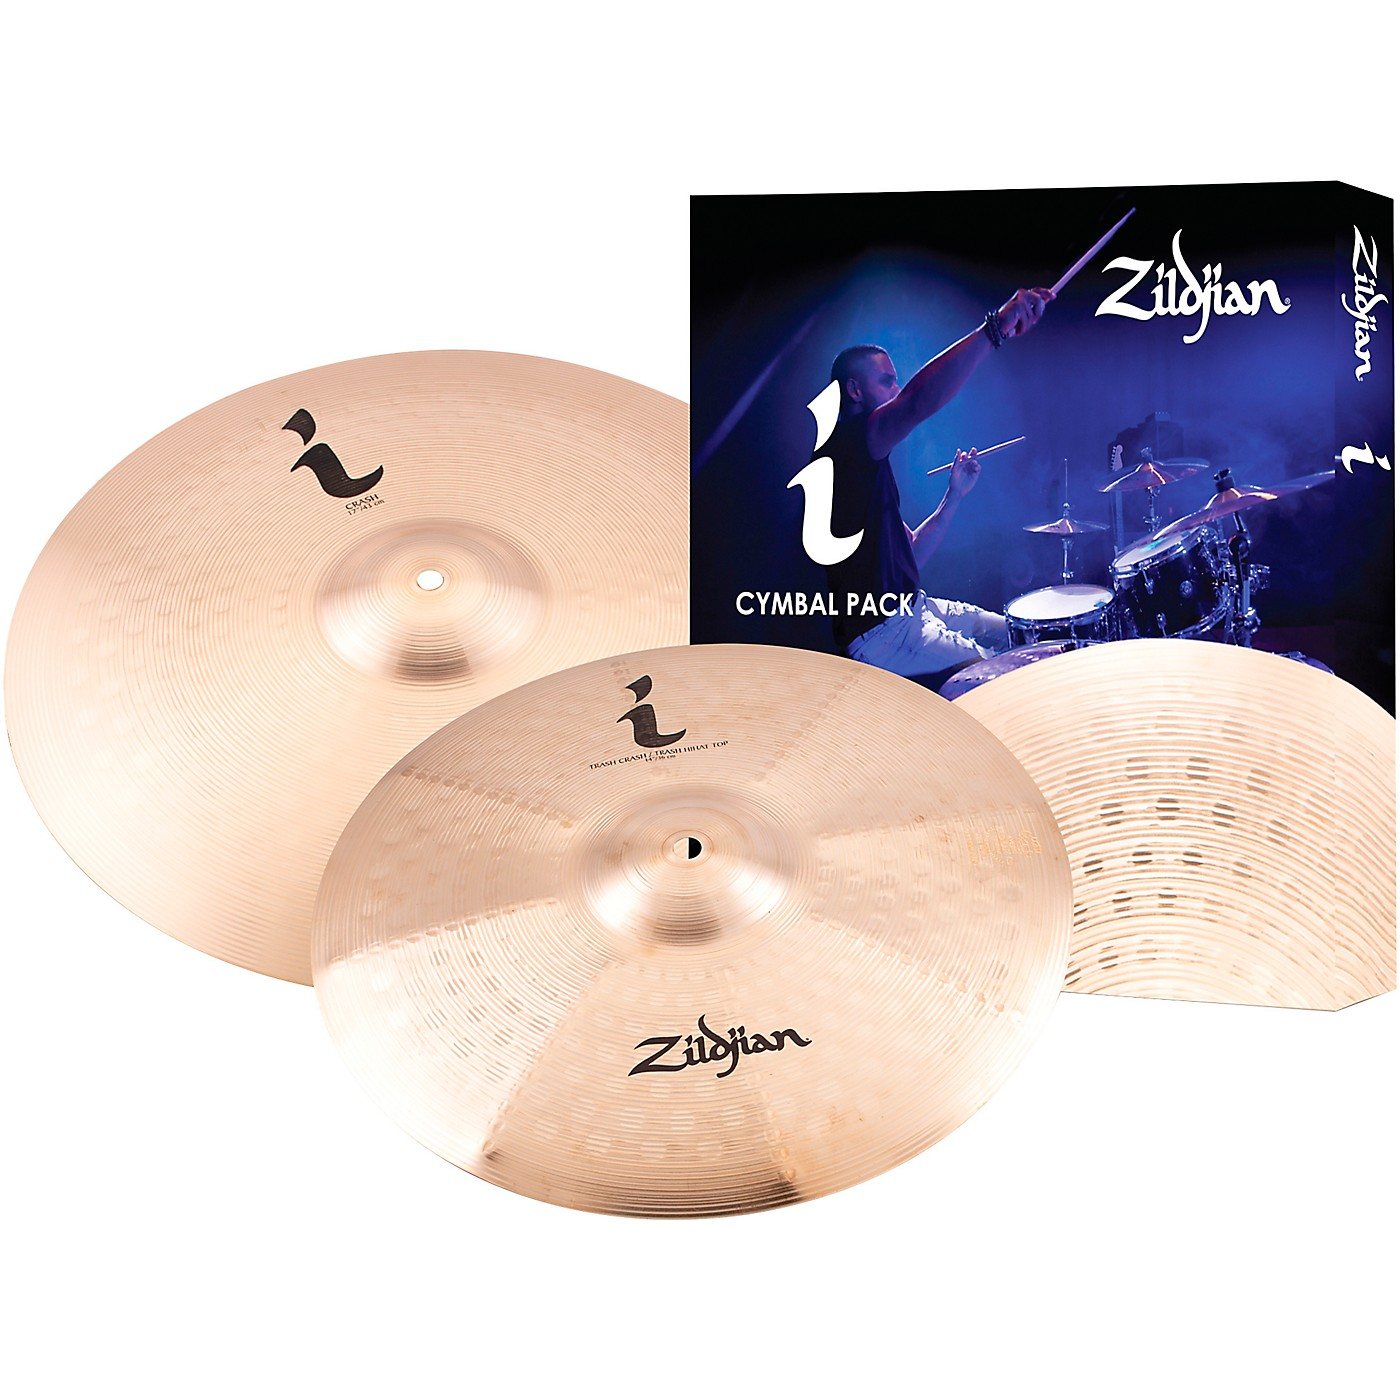 Zildjian I Series Expression Cymbal Pack 1 thumbnail